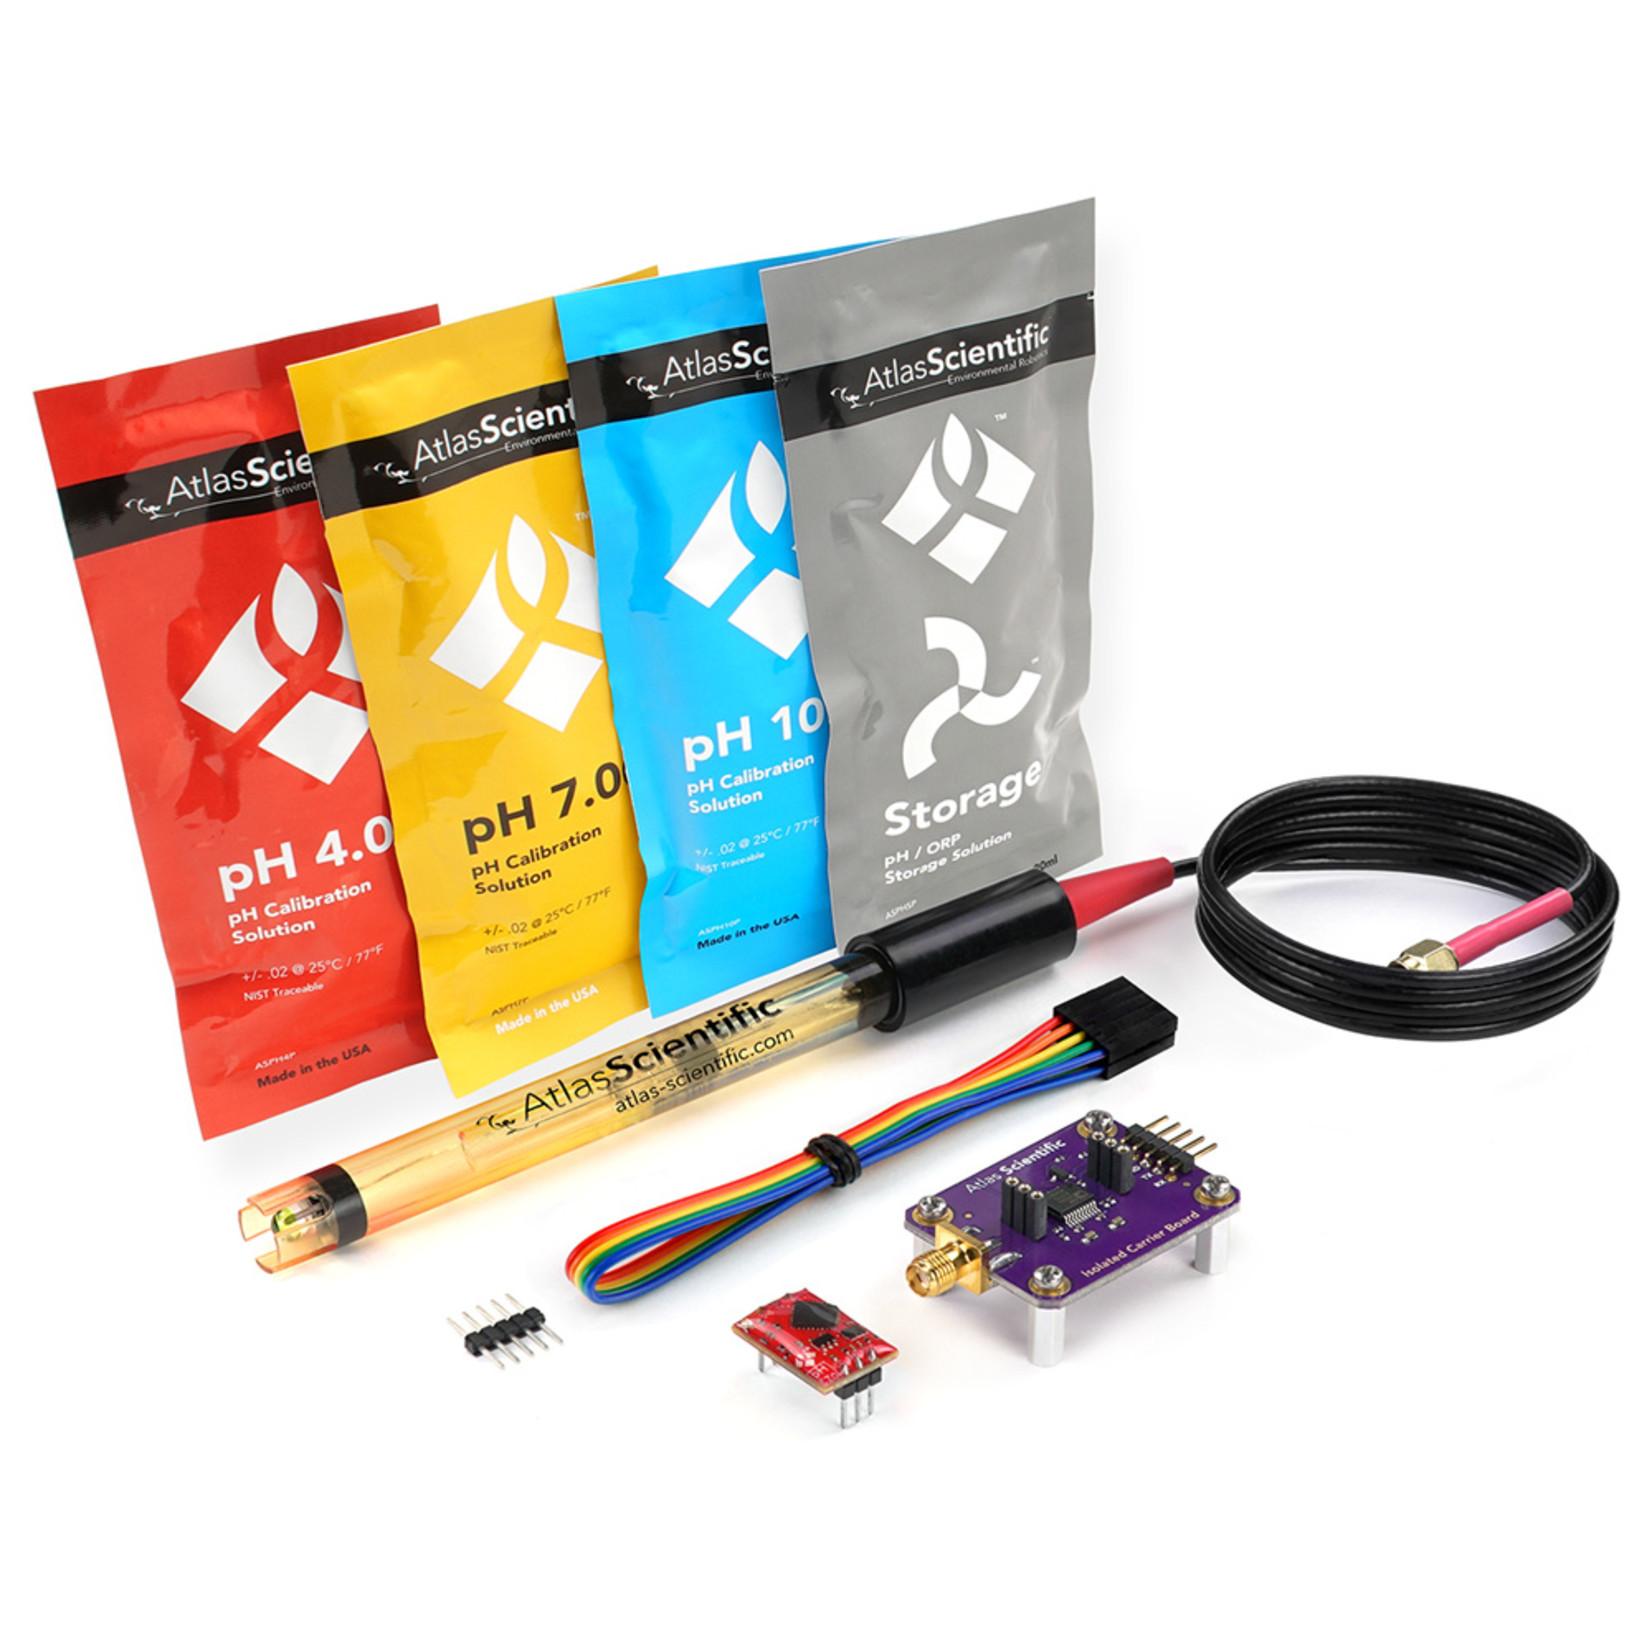 Atlas Scientific pH probe Kit